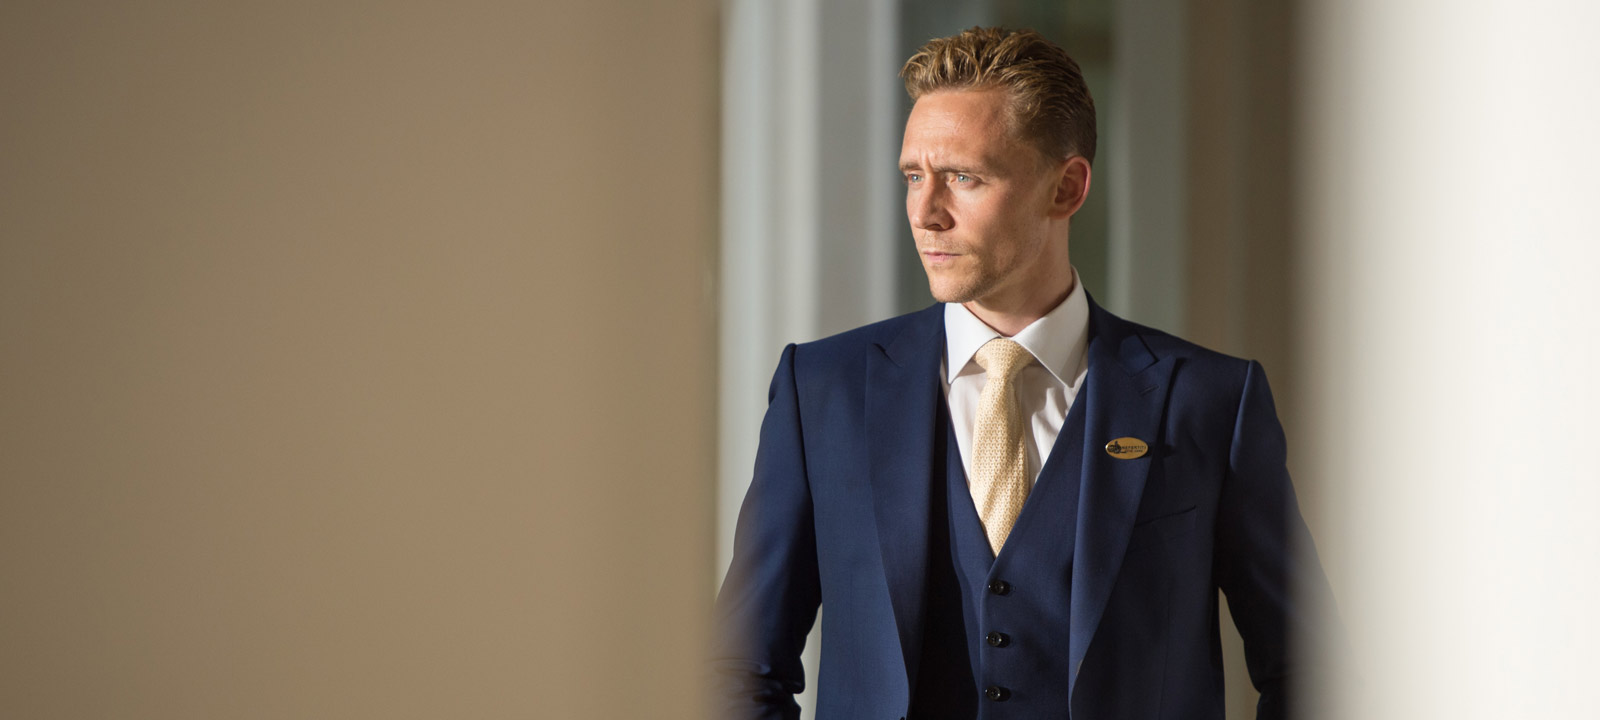 the-night-manager-101-jonathan-hiddleston-2-800×600